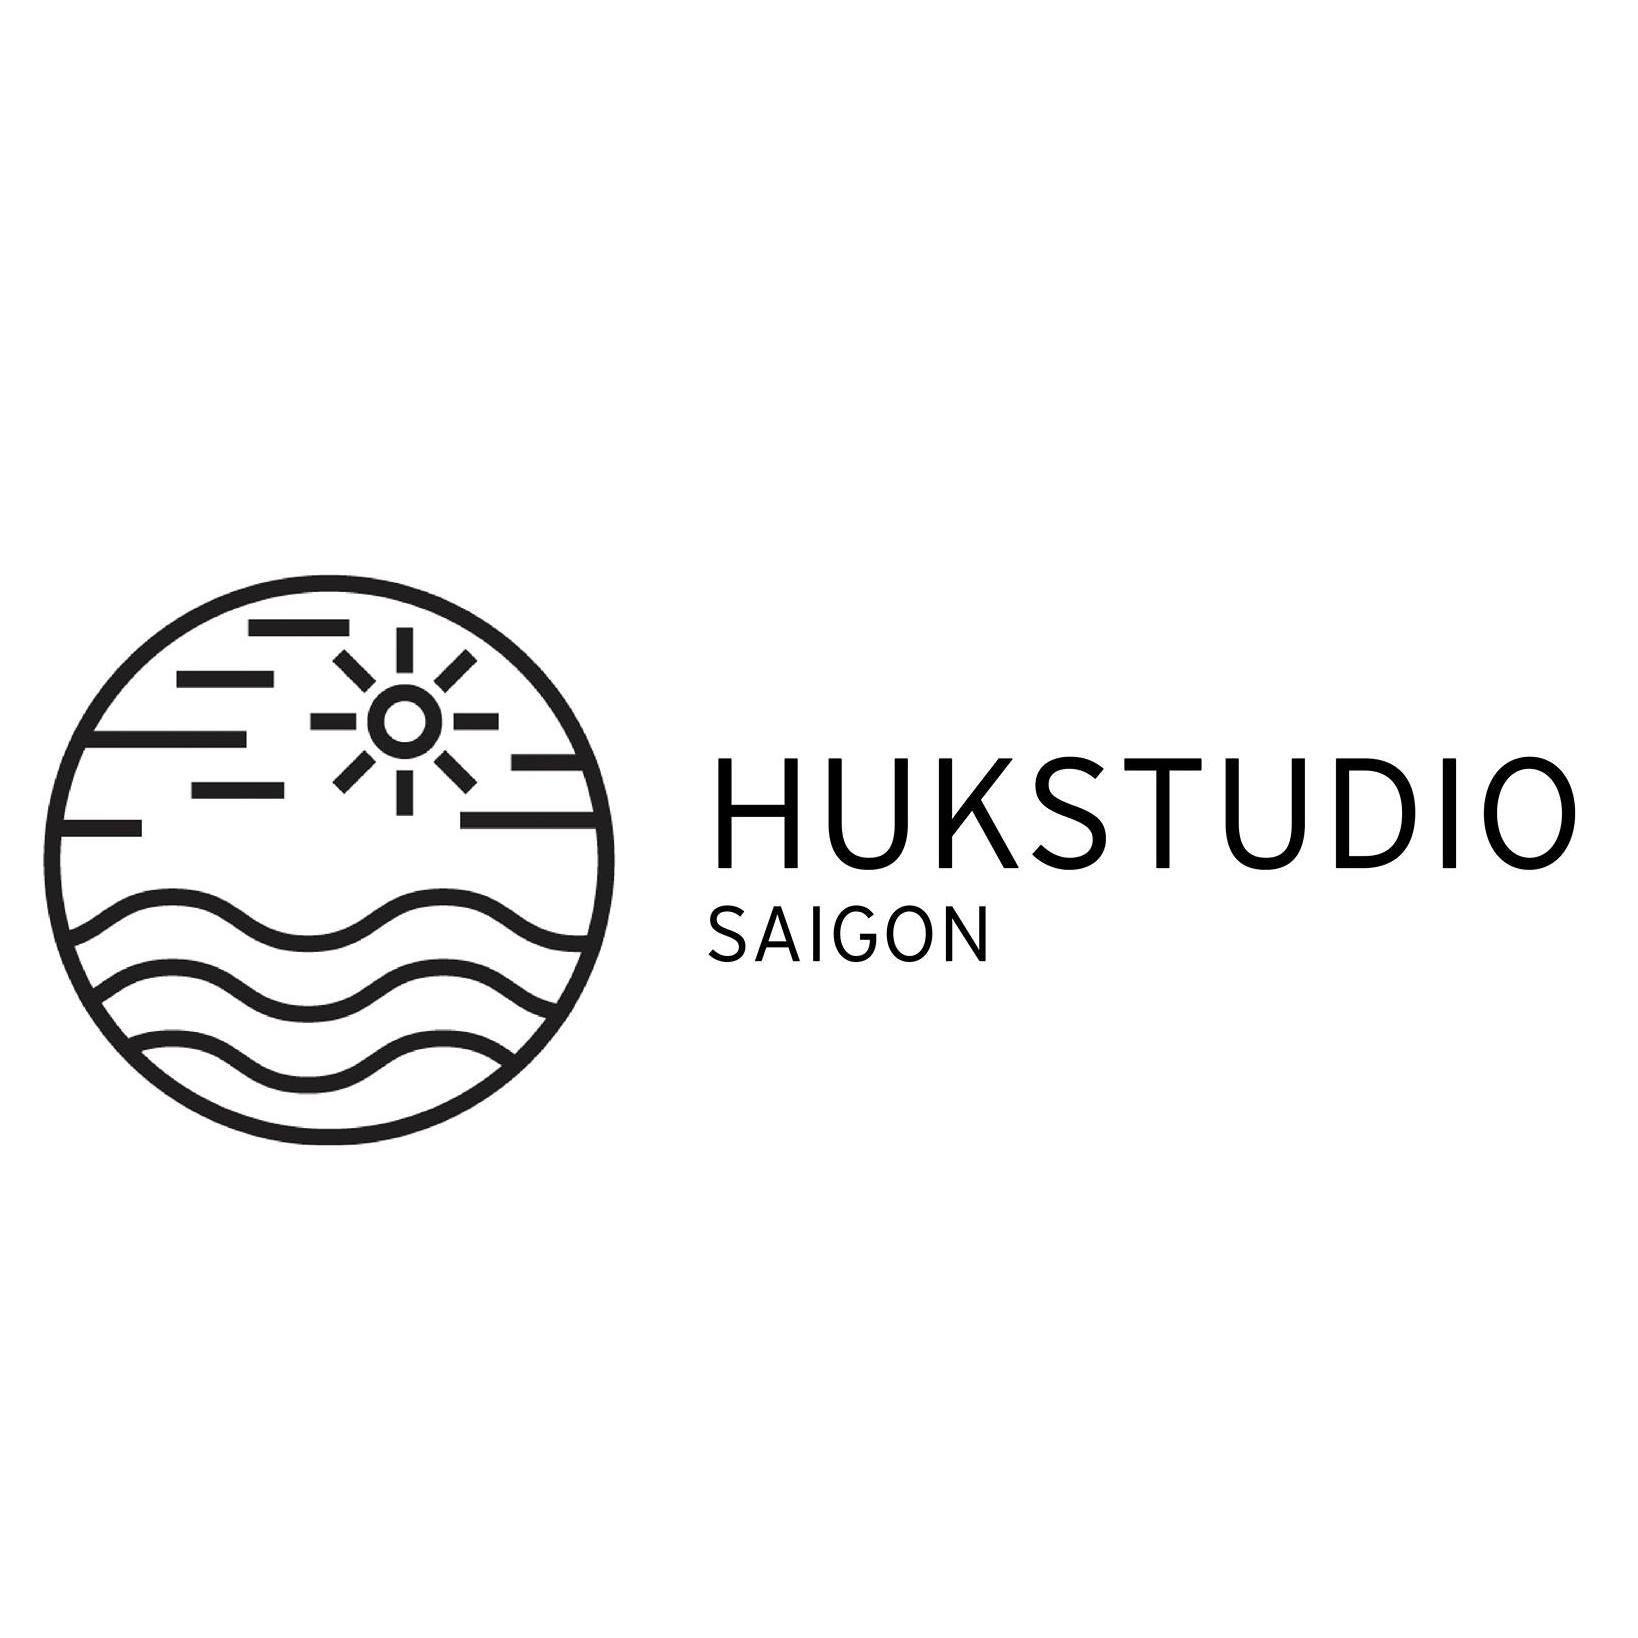 Huk Studio